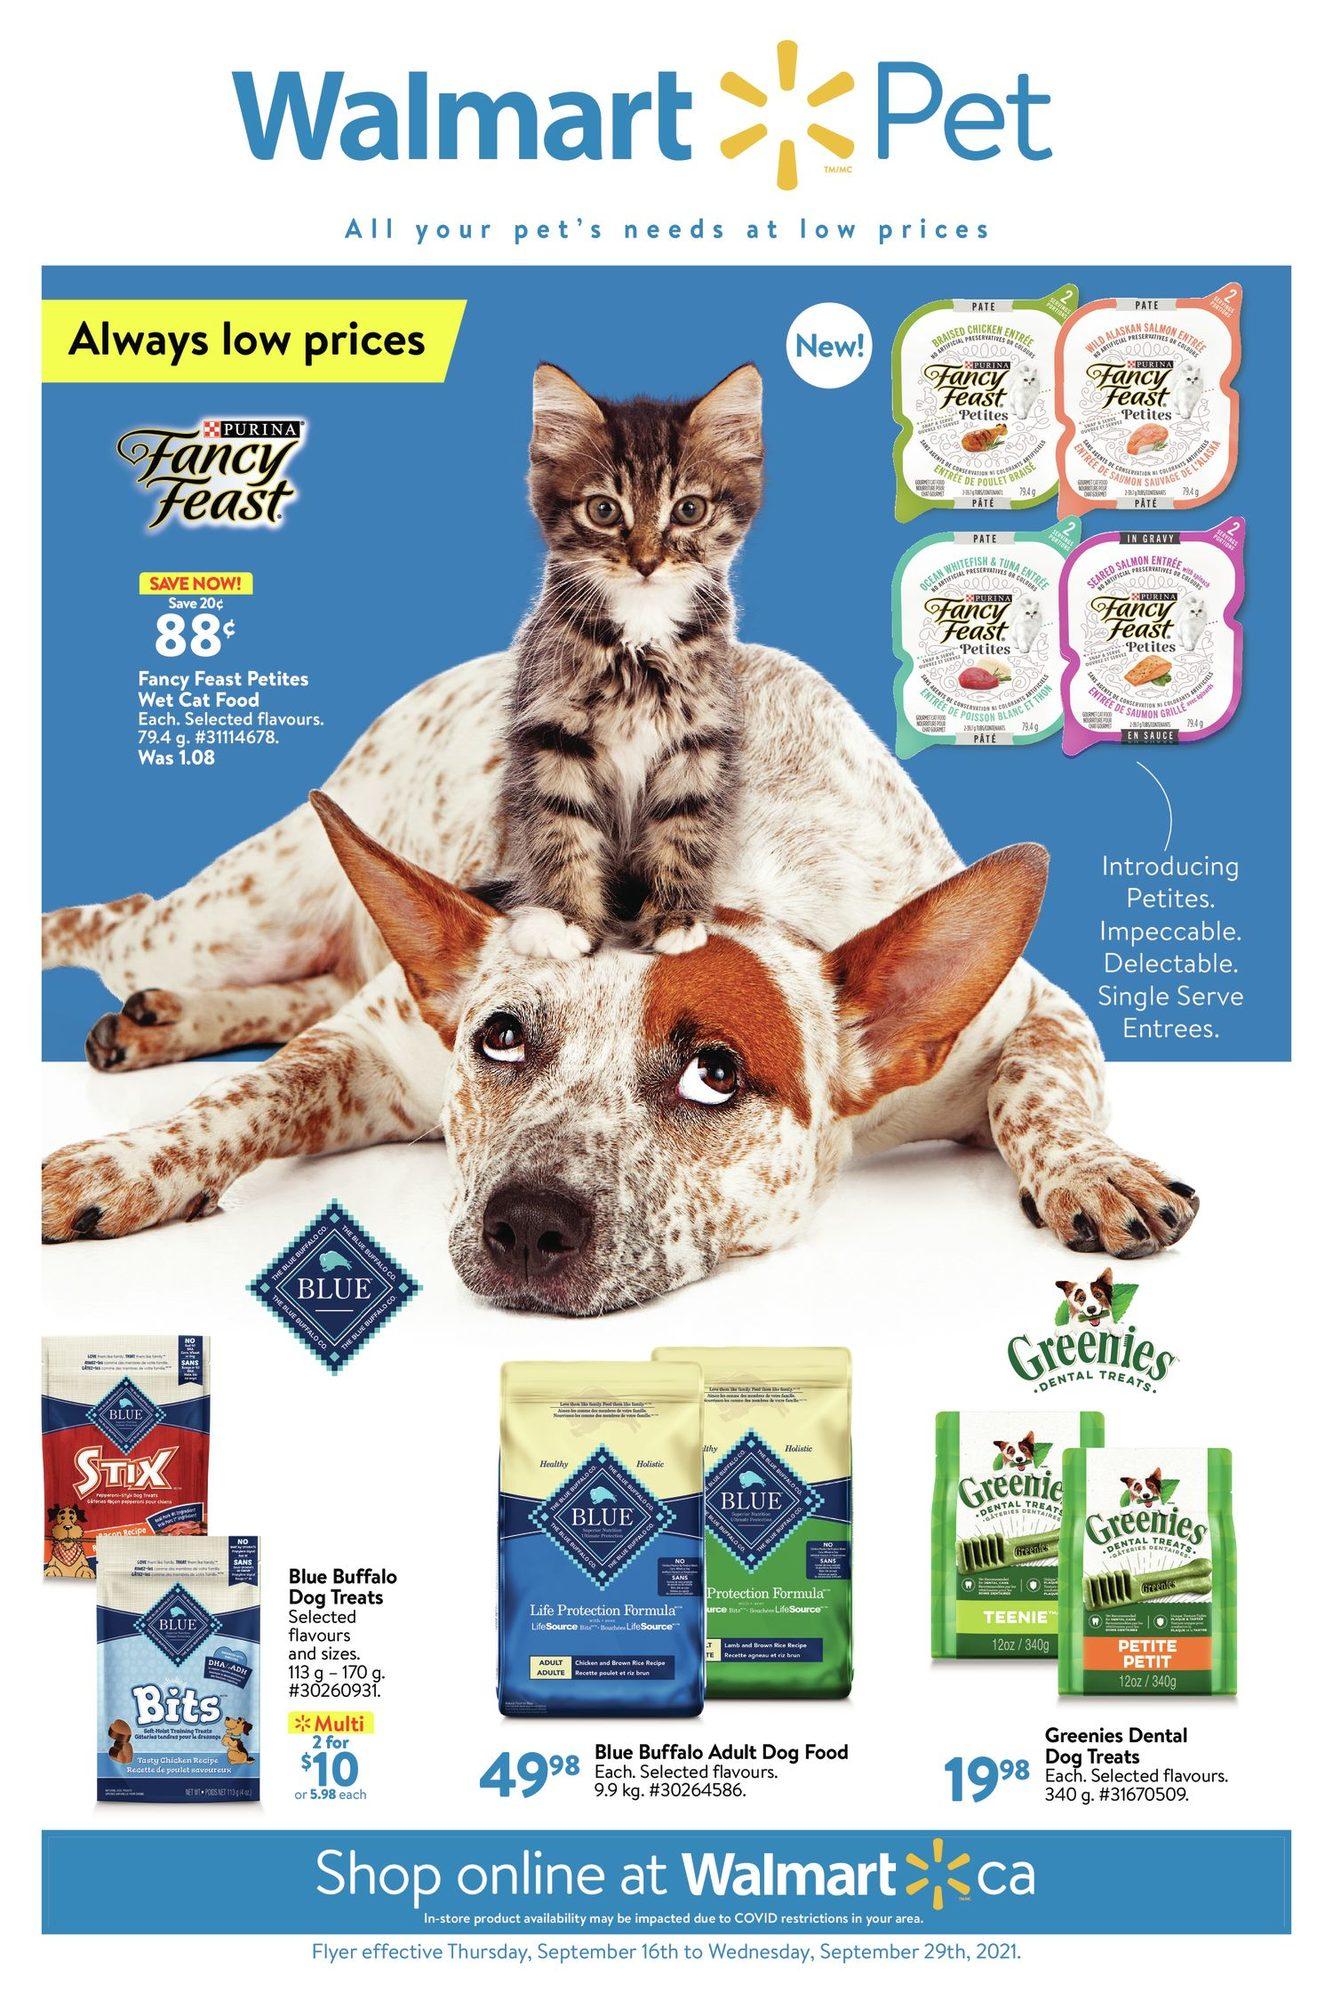 Walmart - Pet Book